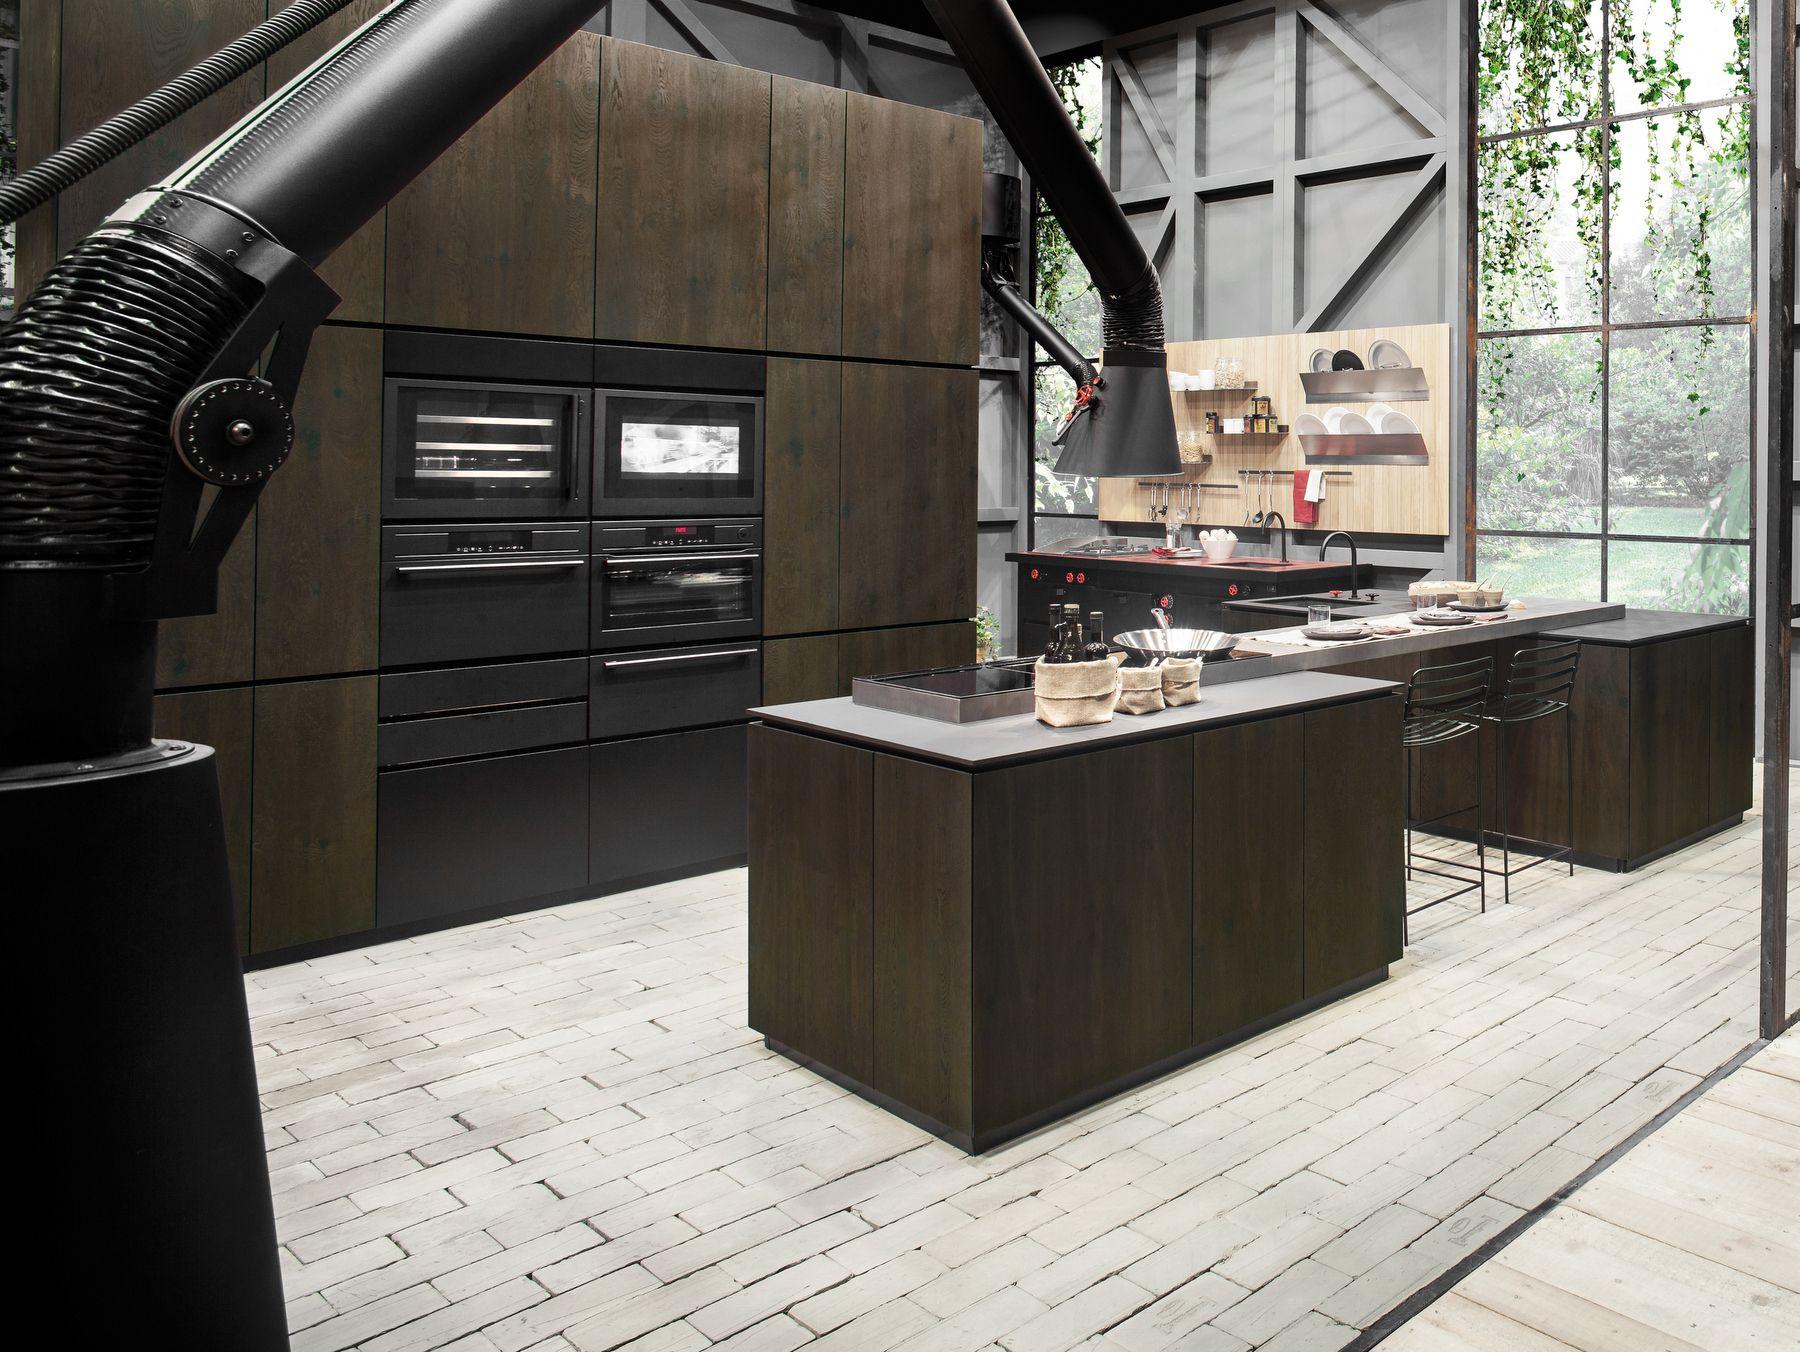 NATURAL SKIN | Kitchen Without Handles By Minacciolo Design Silvio Stefani